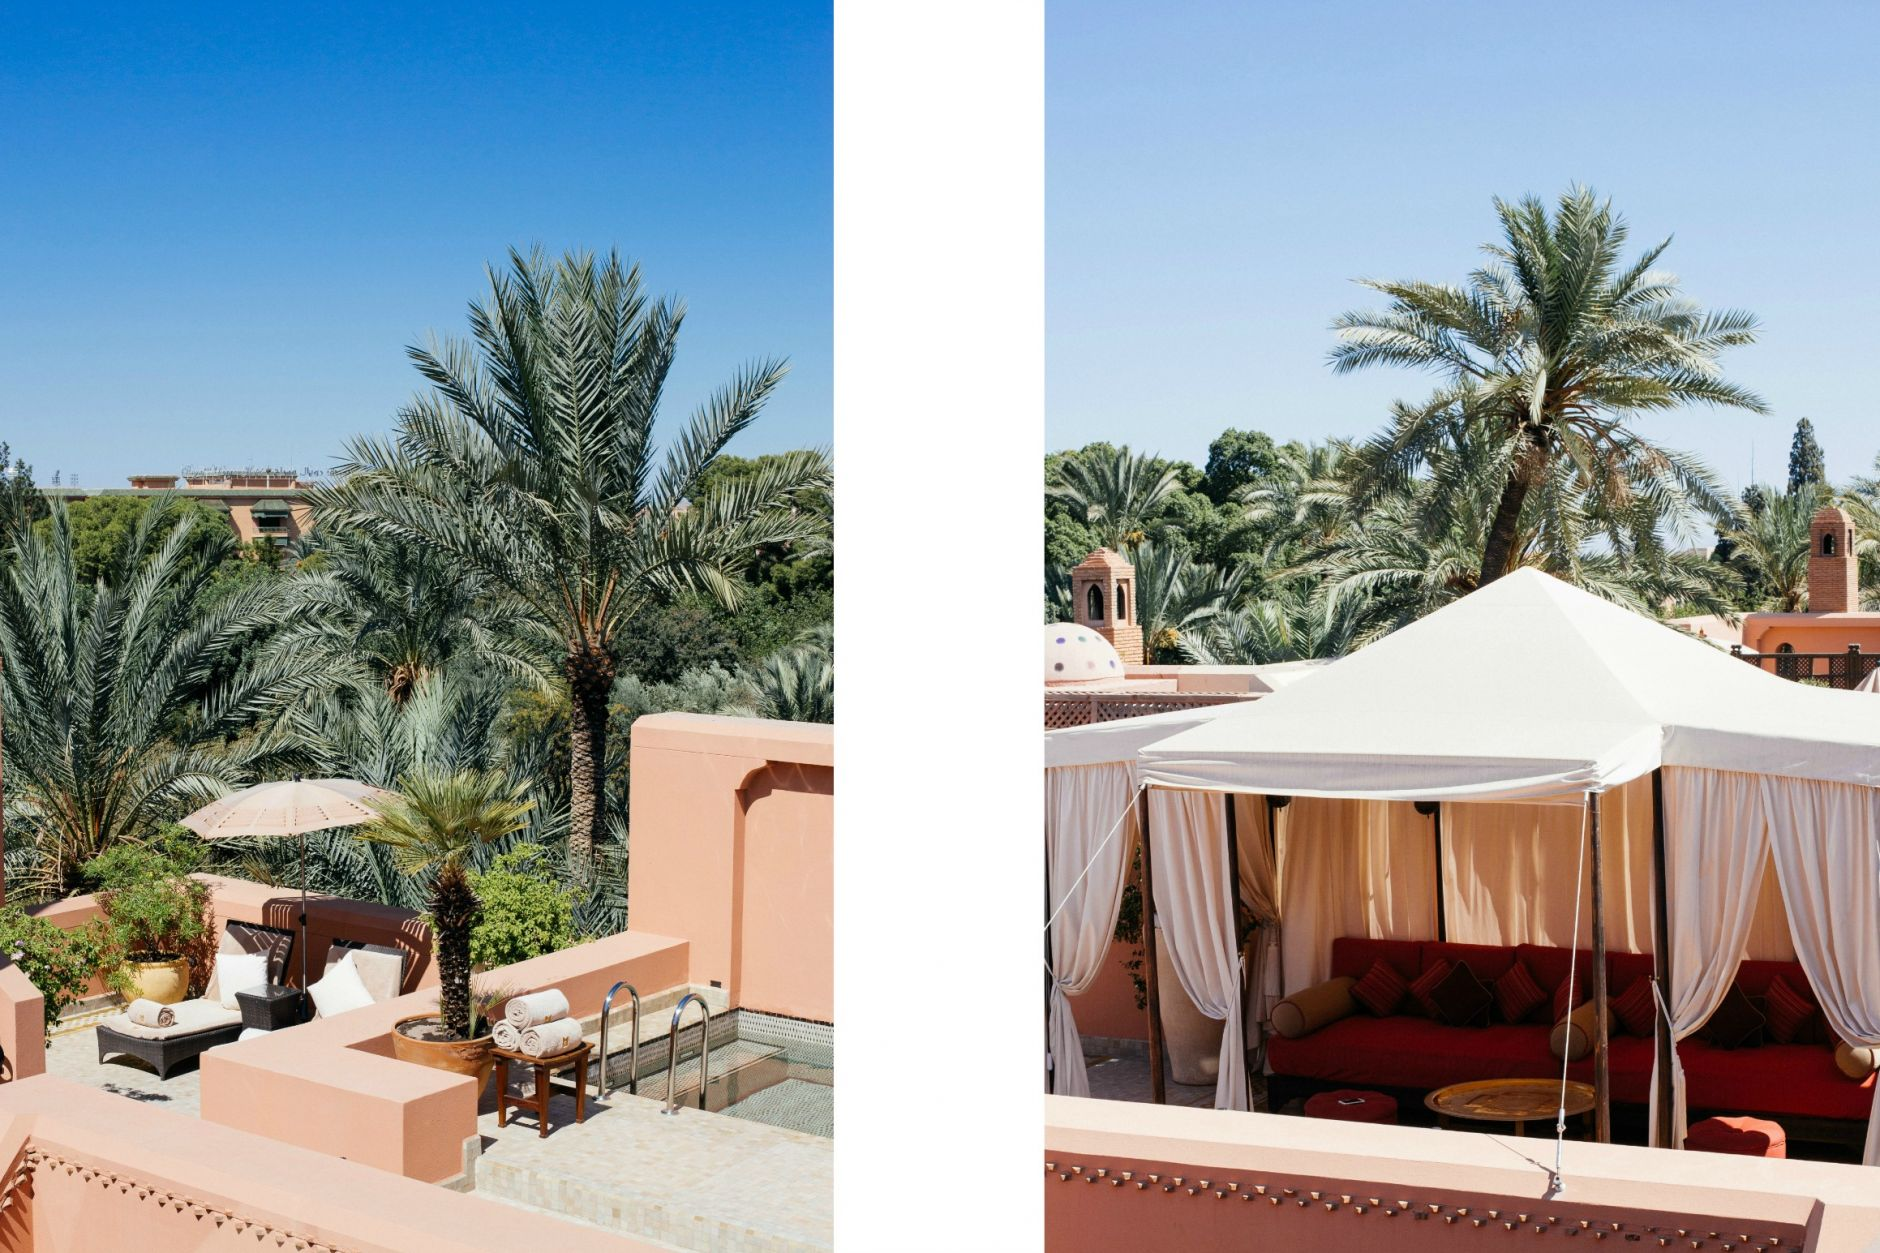 royal-mansour-hotel-luxury-marrakesch-marrakesh-morocco-edisa-shahini-disicouture-blog-duo-12